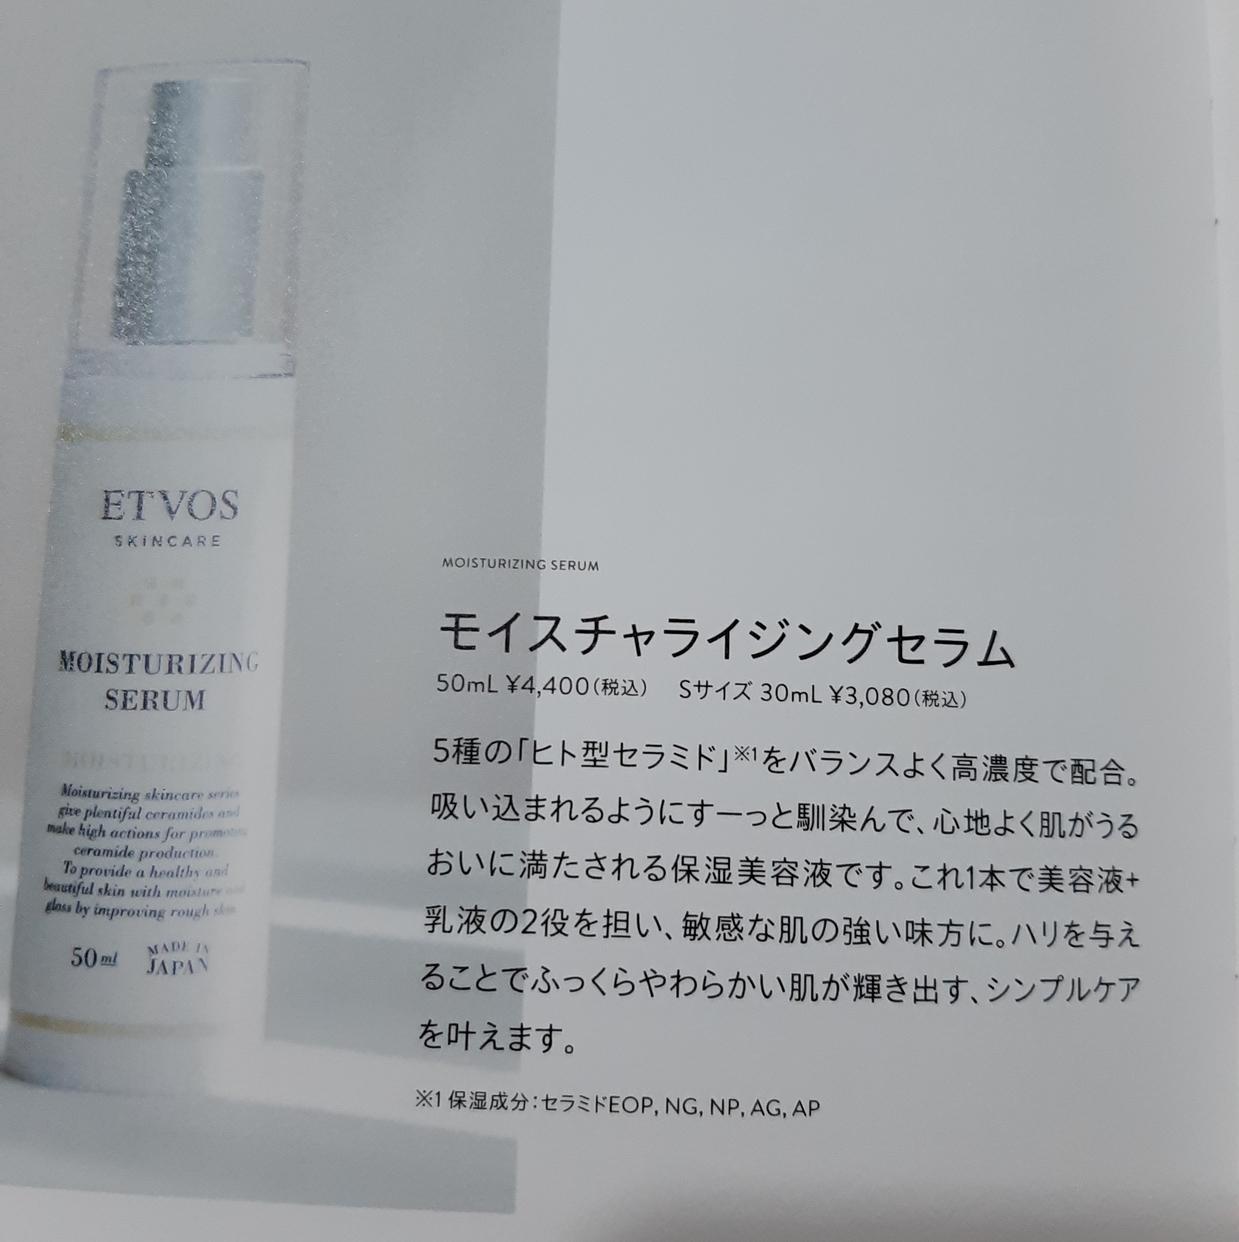 ETVOS(エトヴォス) モイスチャライジングセラムを使ったyu_yuさんのクチコミ画像1